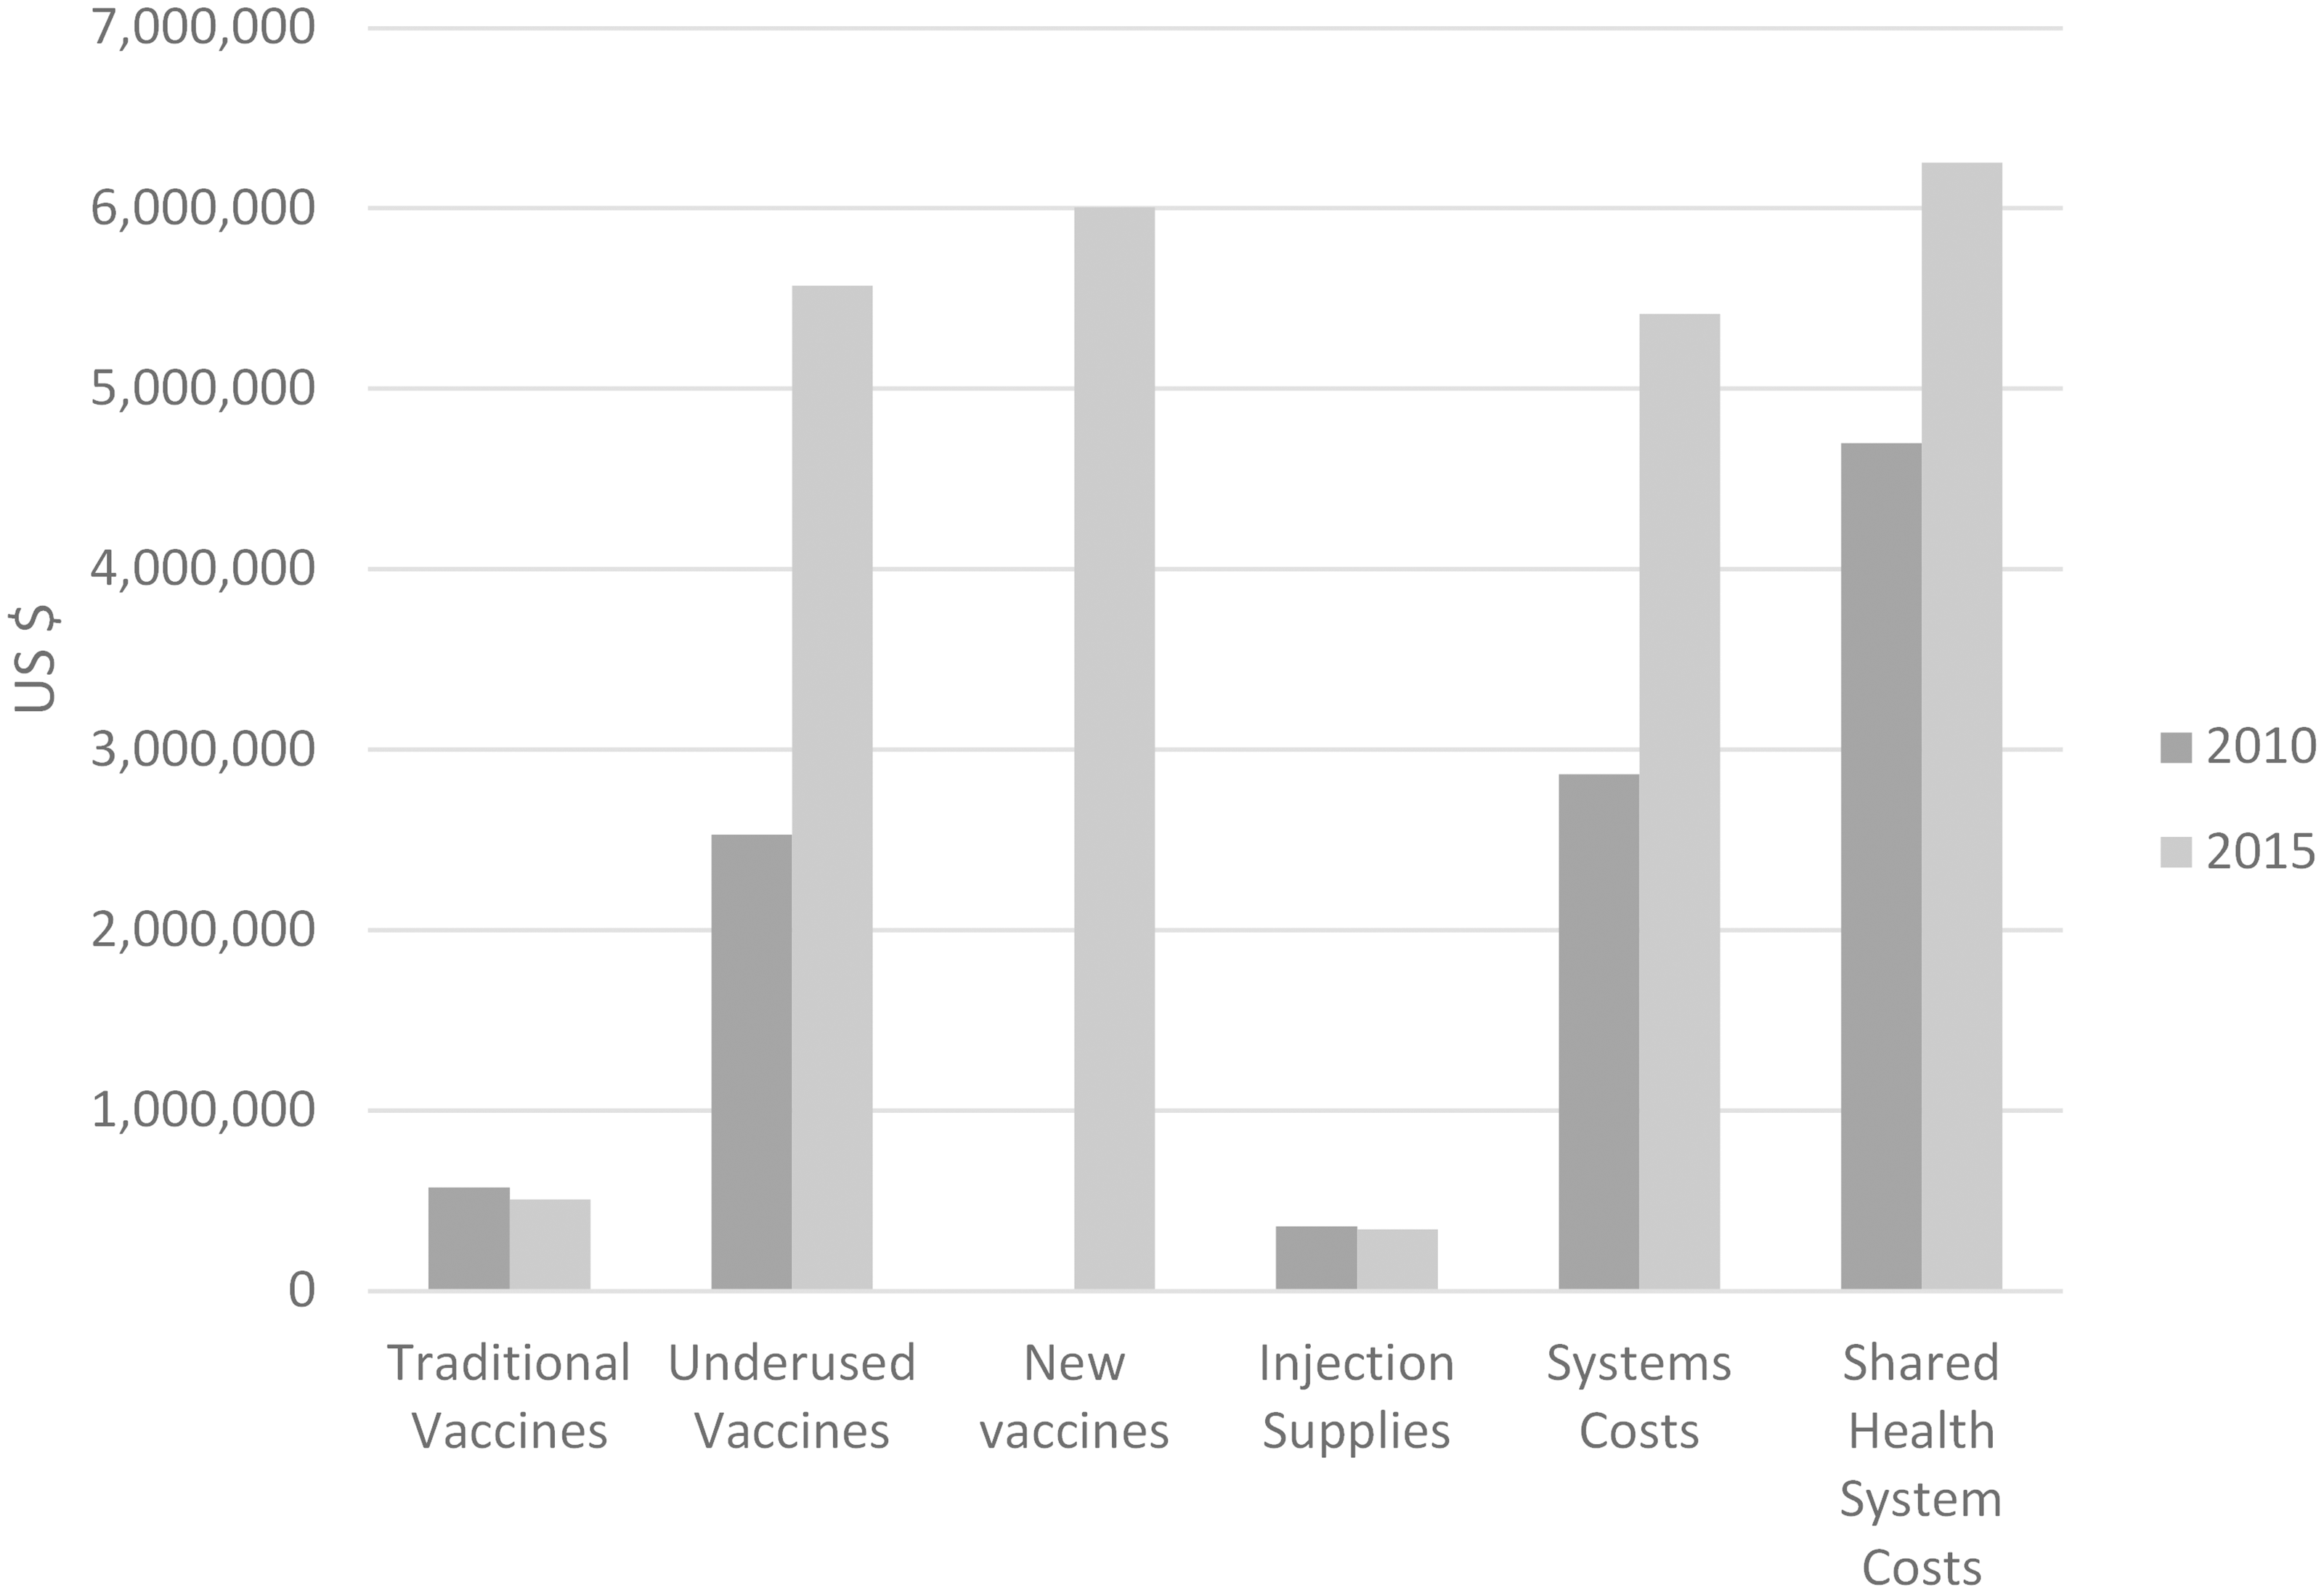 "DPRK baseline immunization budget in 2010 and forecast expenditures in 2015 [<em class=""ref"">21</em>]."